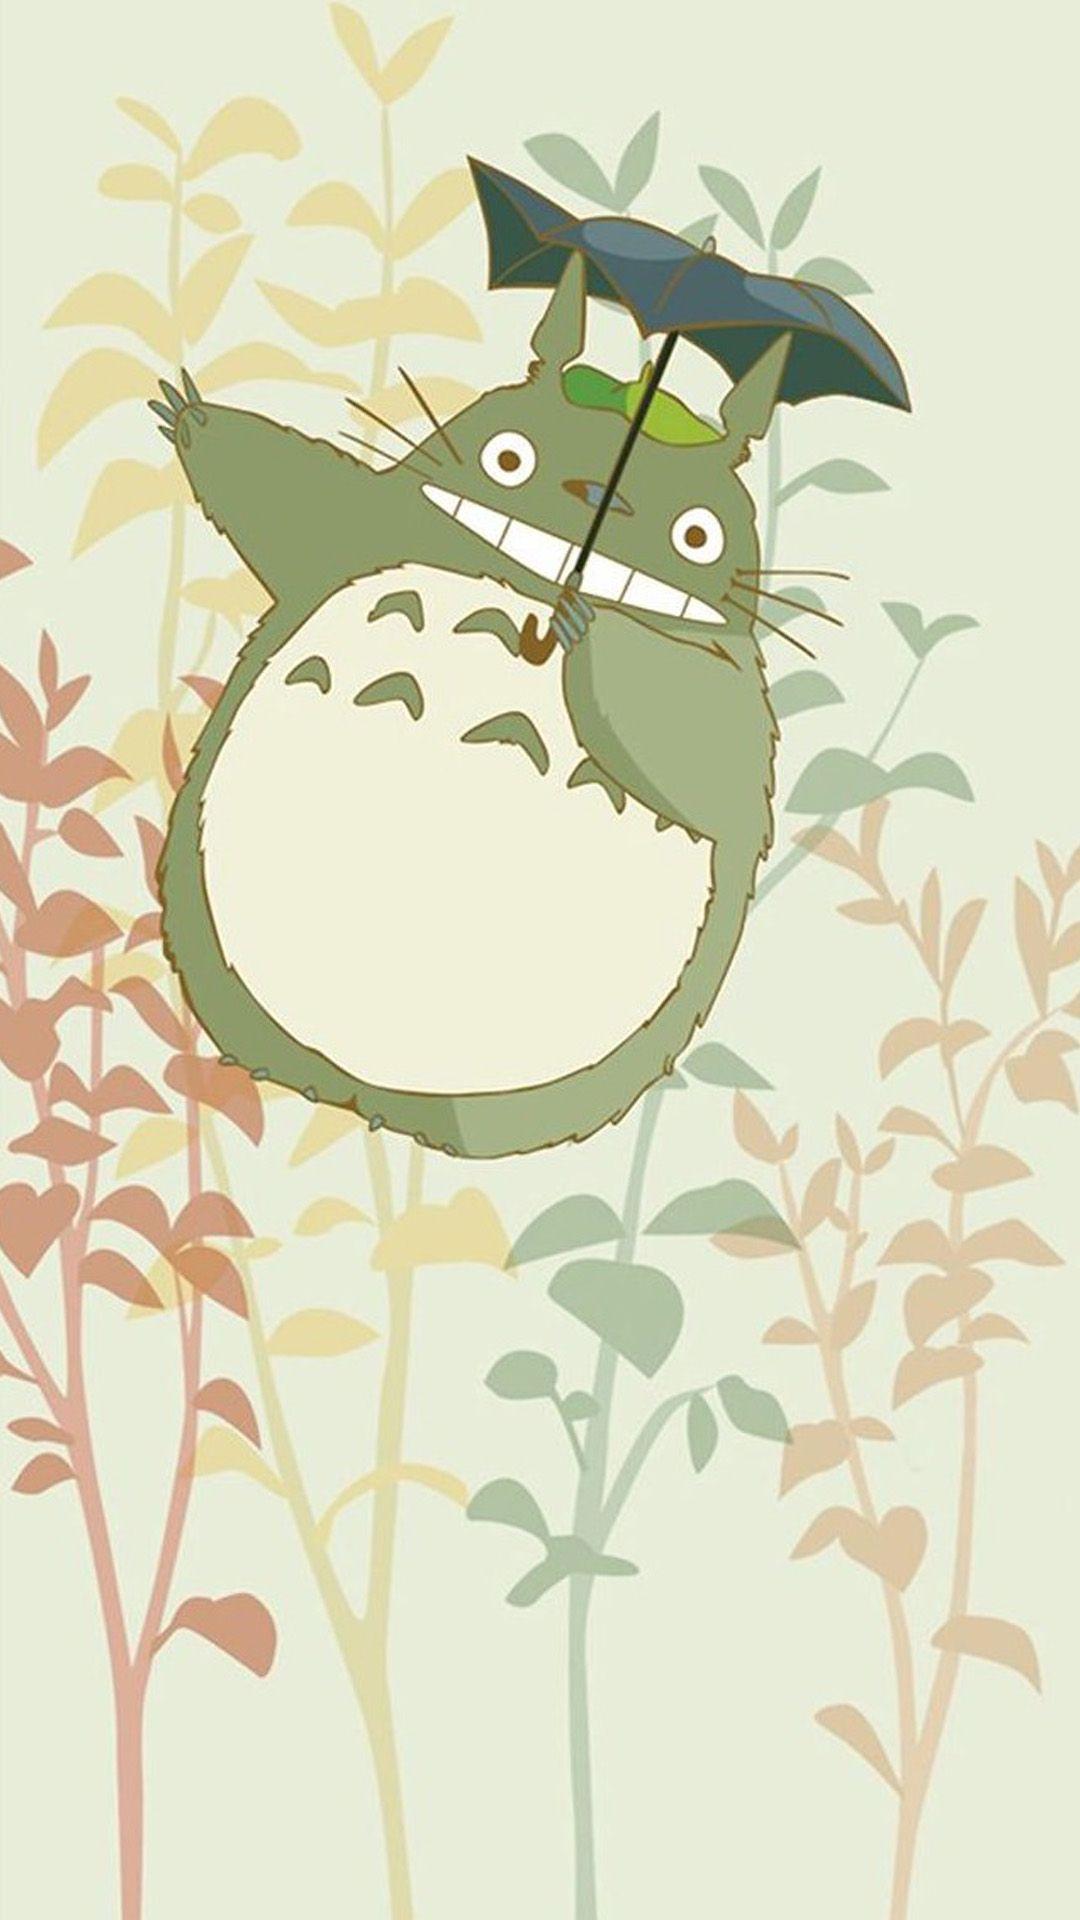 Cute My Neighbor Totoro iPhone 6 wallpaper | Wallpaper ...